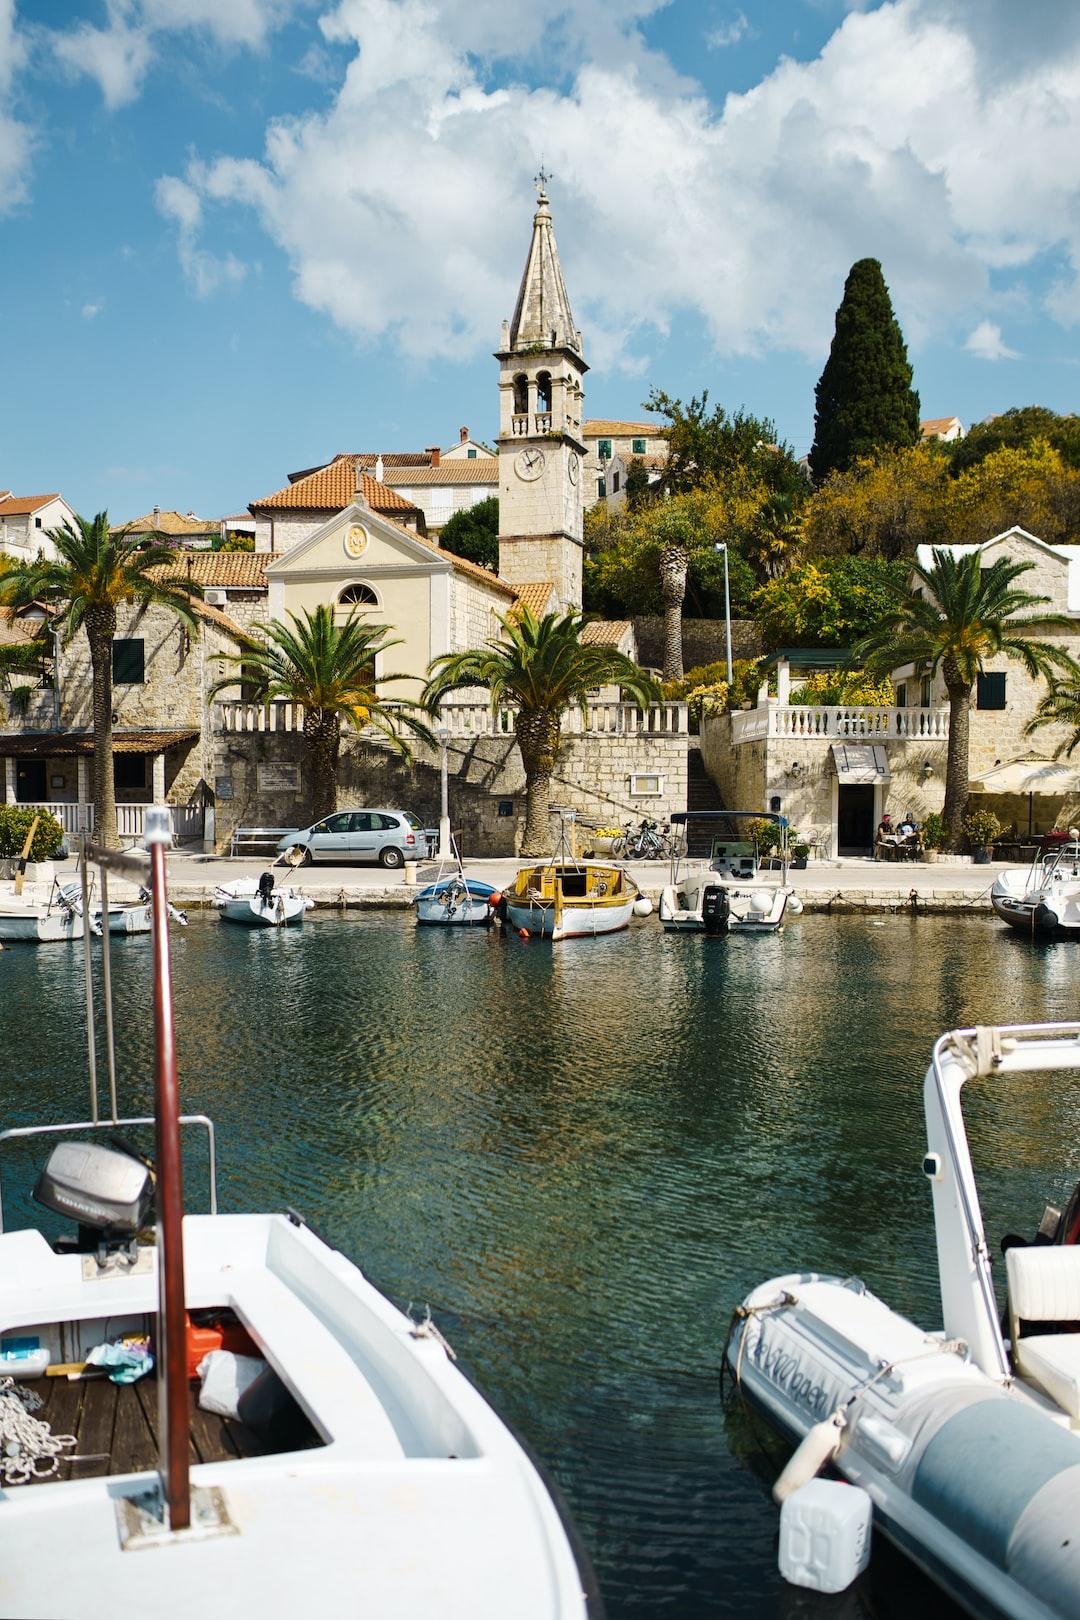 Old town in Croatia in Brač, sea, port, boats, palms